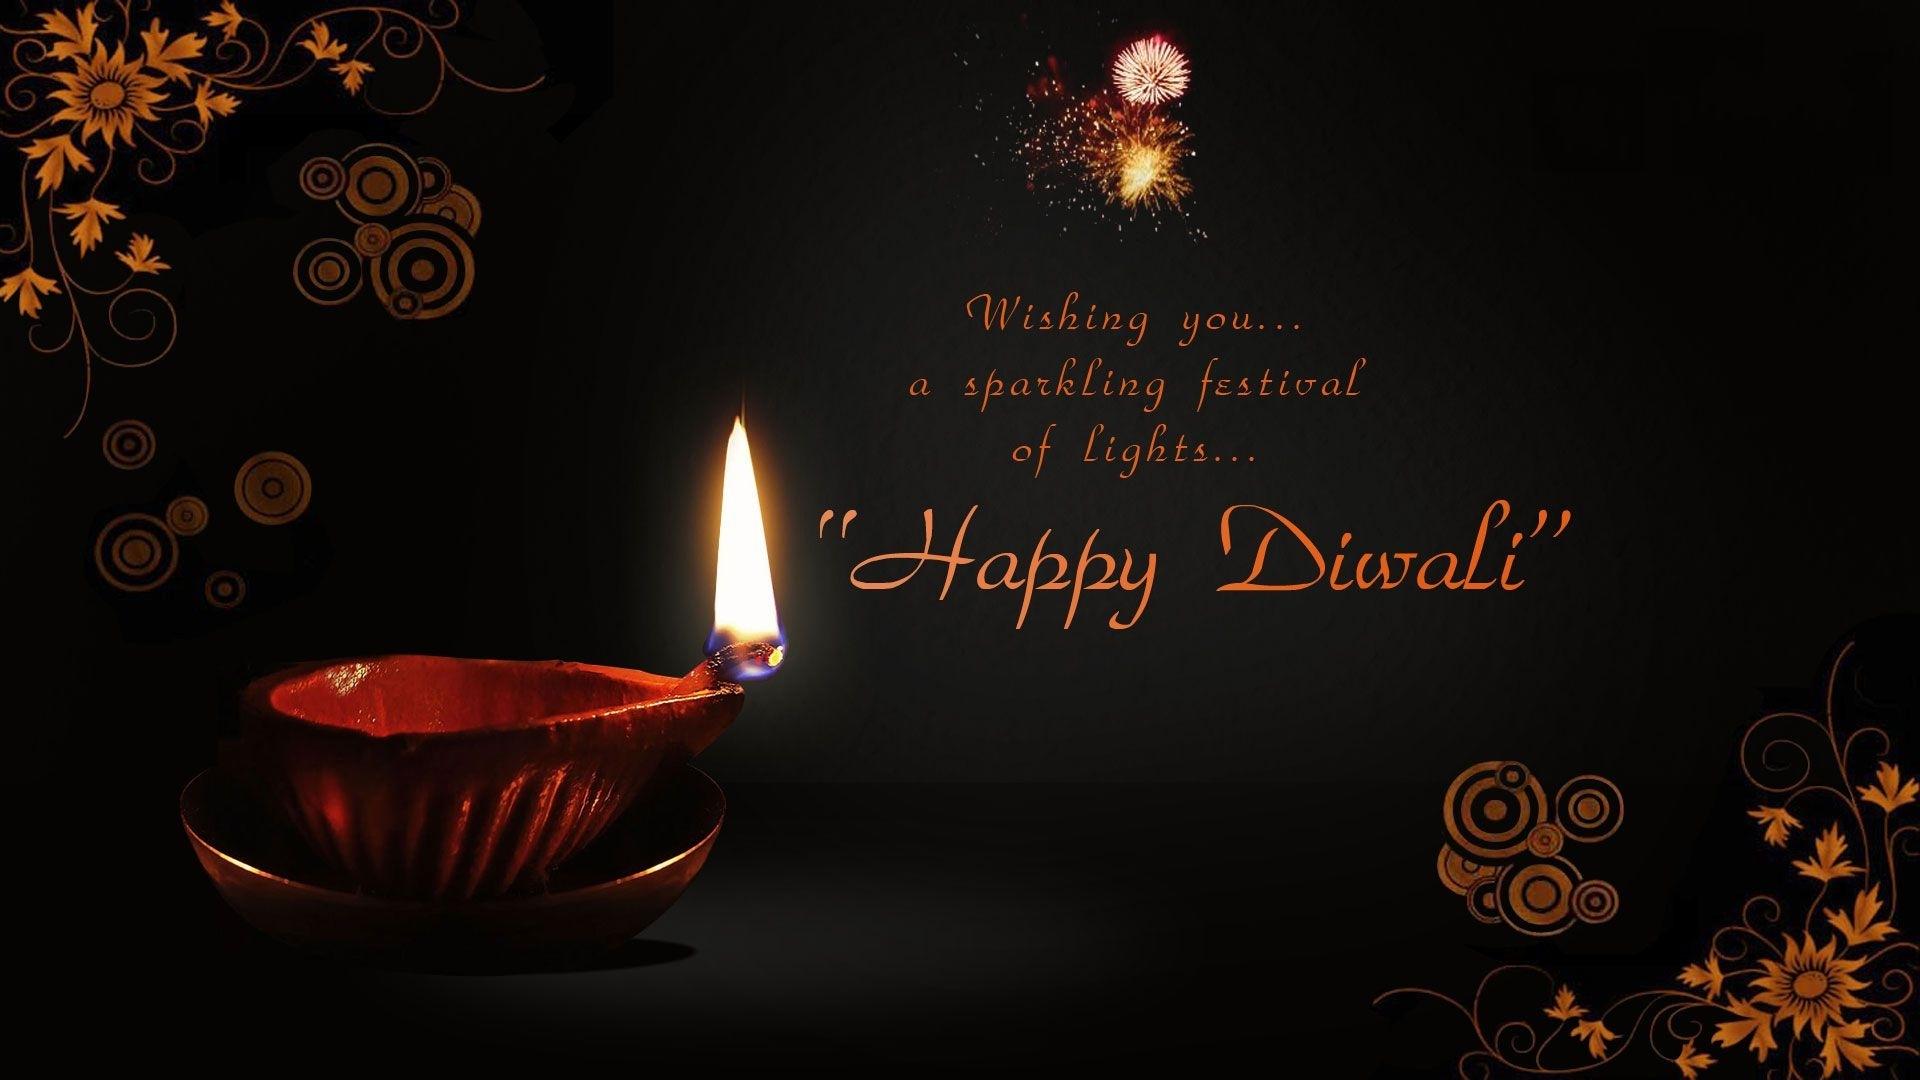 happy diwali photos hd wallpaper | hd diwali wallpapers for mobile